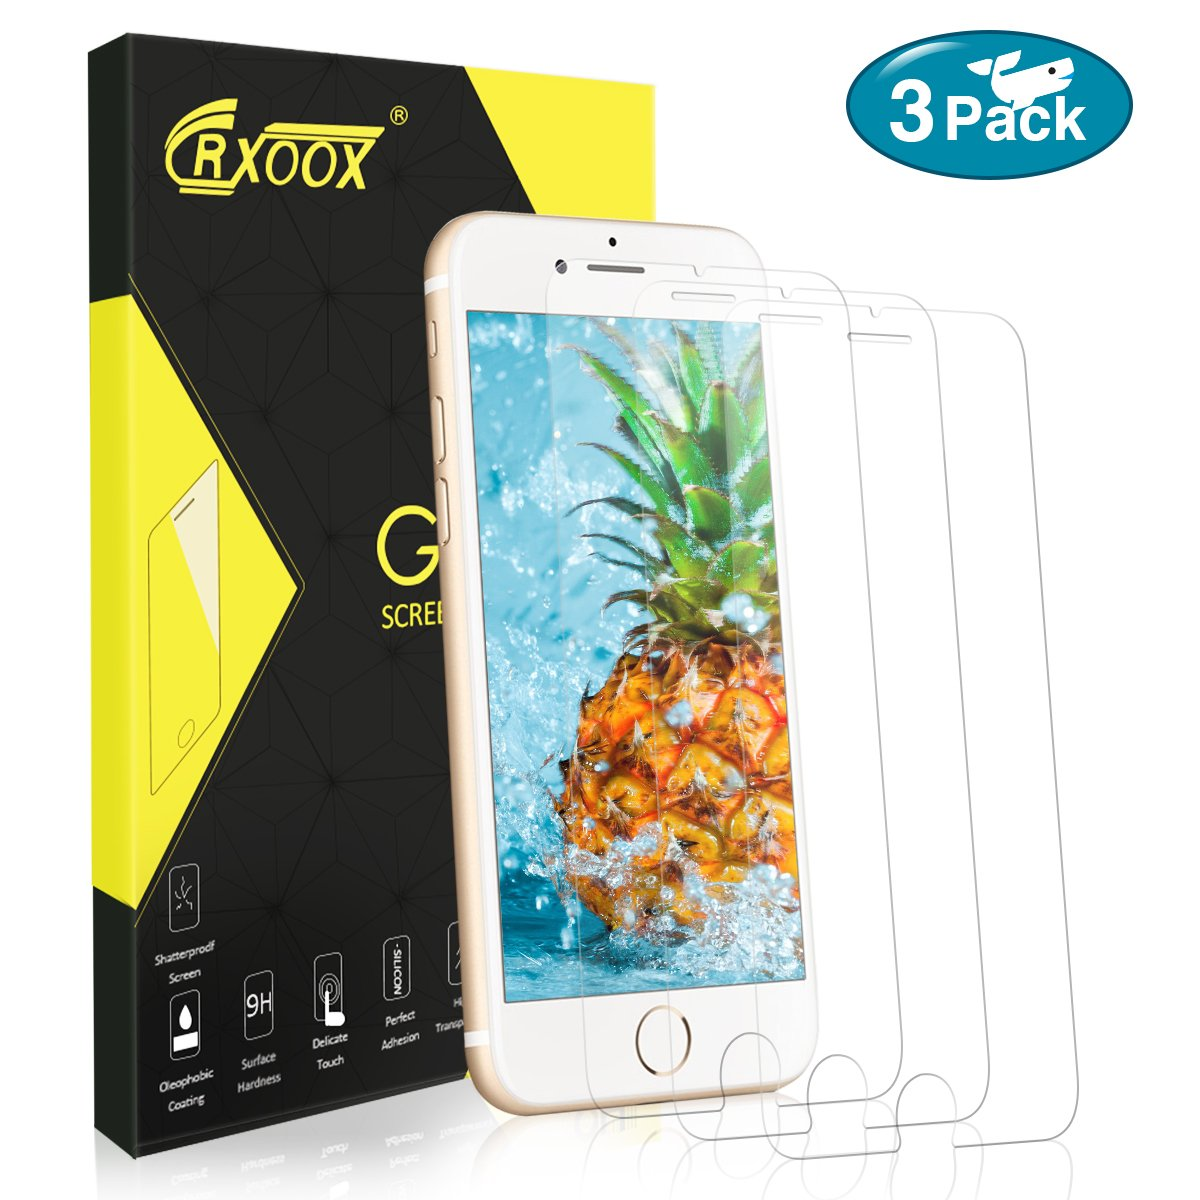 CRXOOX 3 Piezas Protector Pantalla para iPhone 7//8 F/ácil Instalaci/ón 9H Dureza Alta Definicion Cristal Vidrio Templado para iPhone 7//8 Anti-Ara/ñazos Transparente